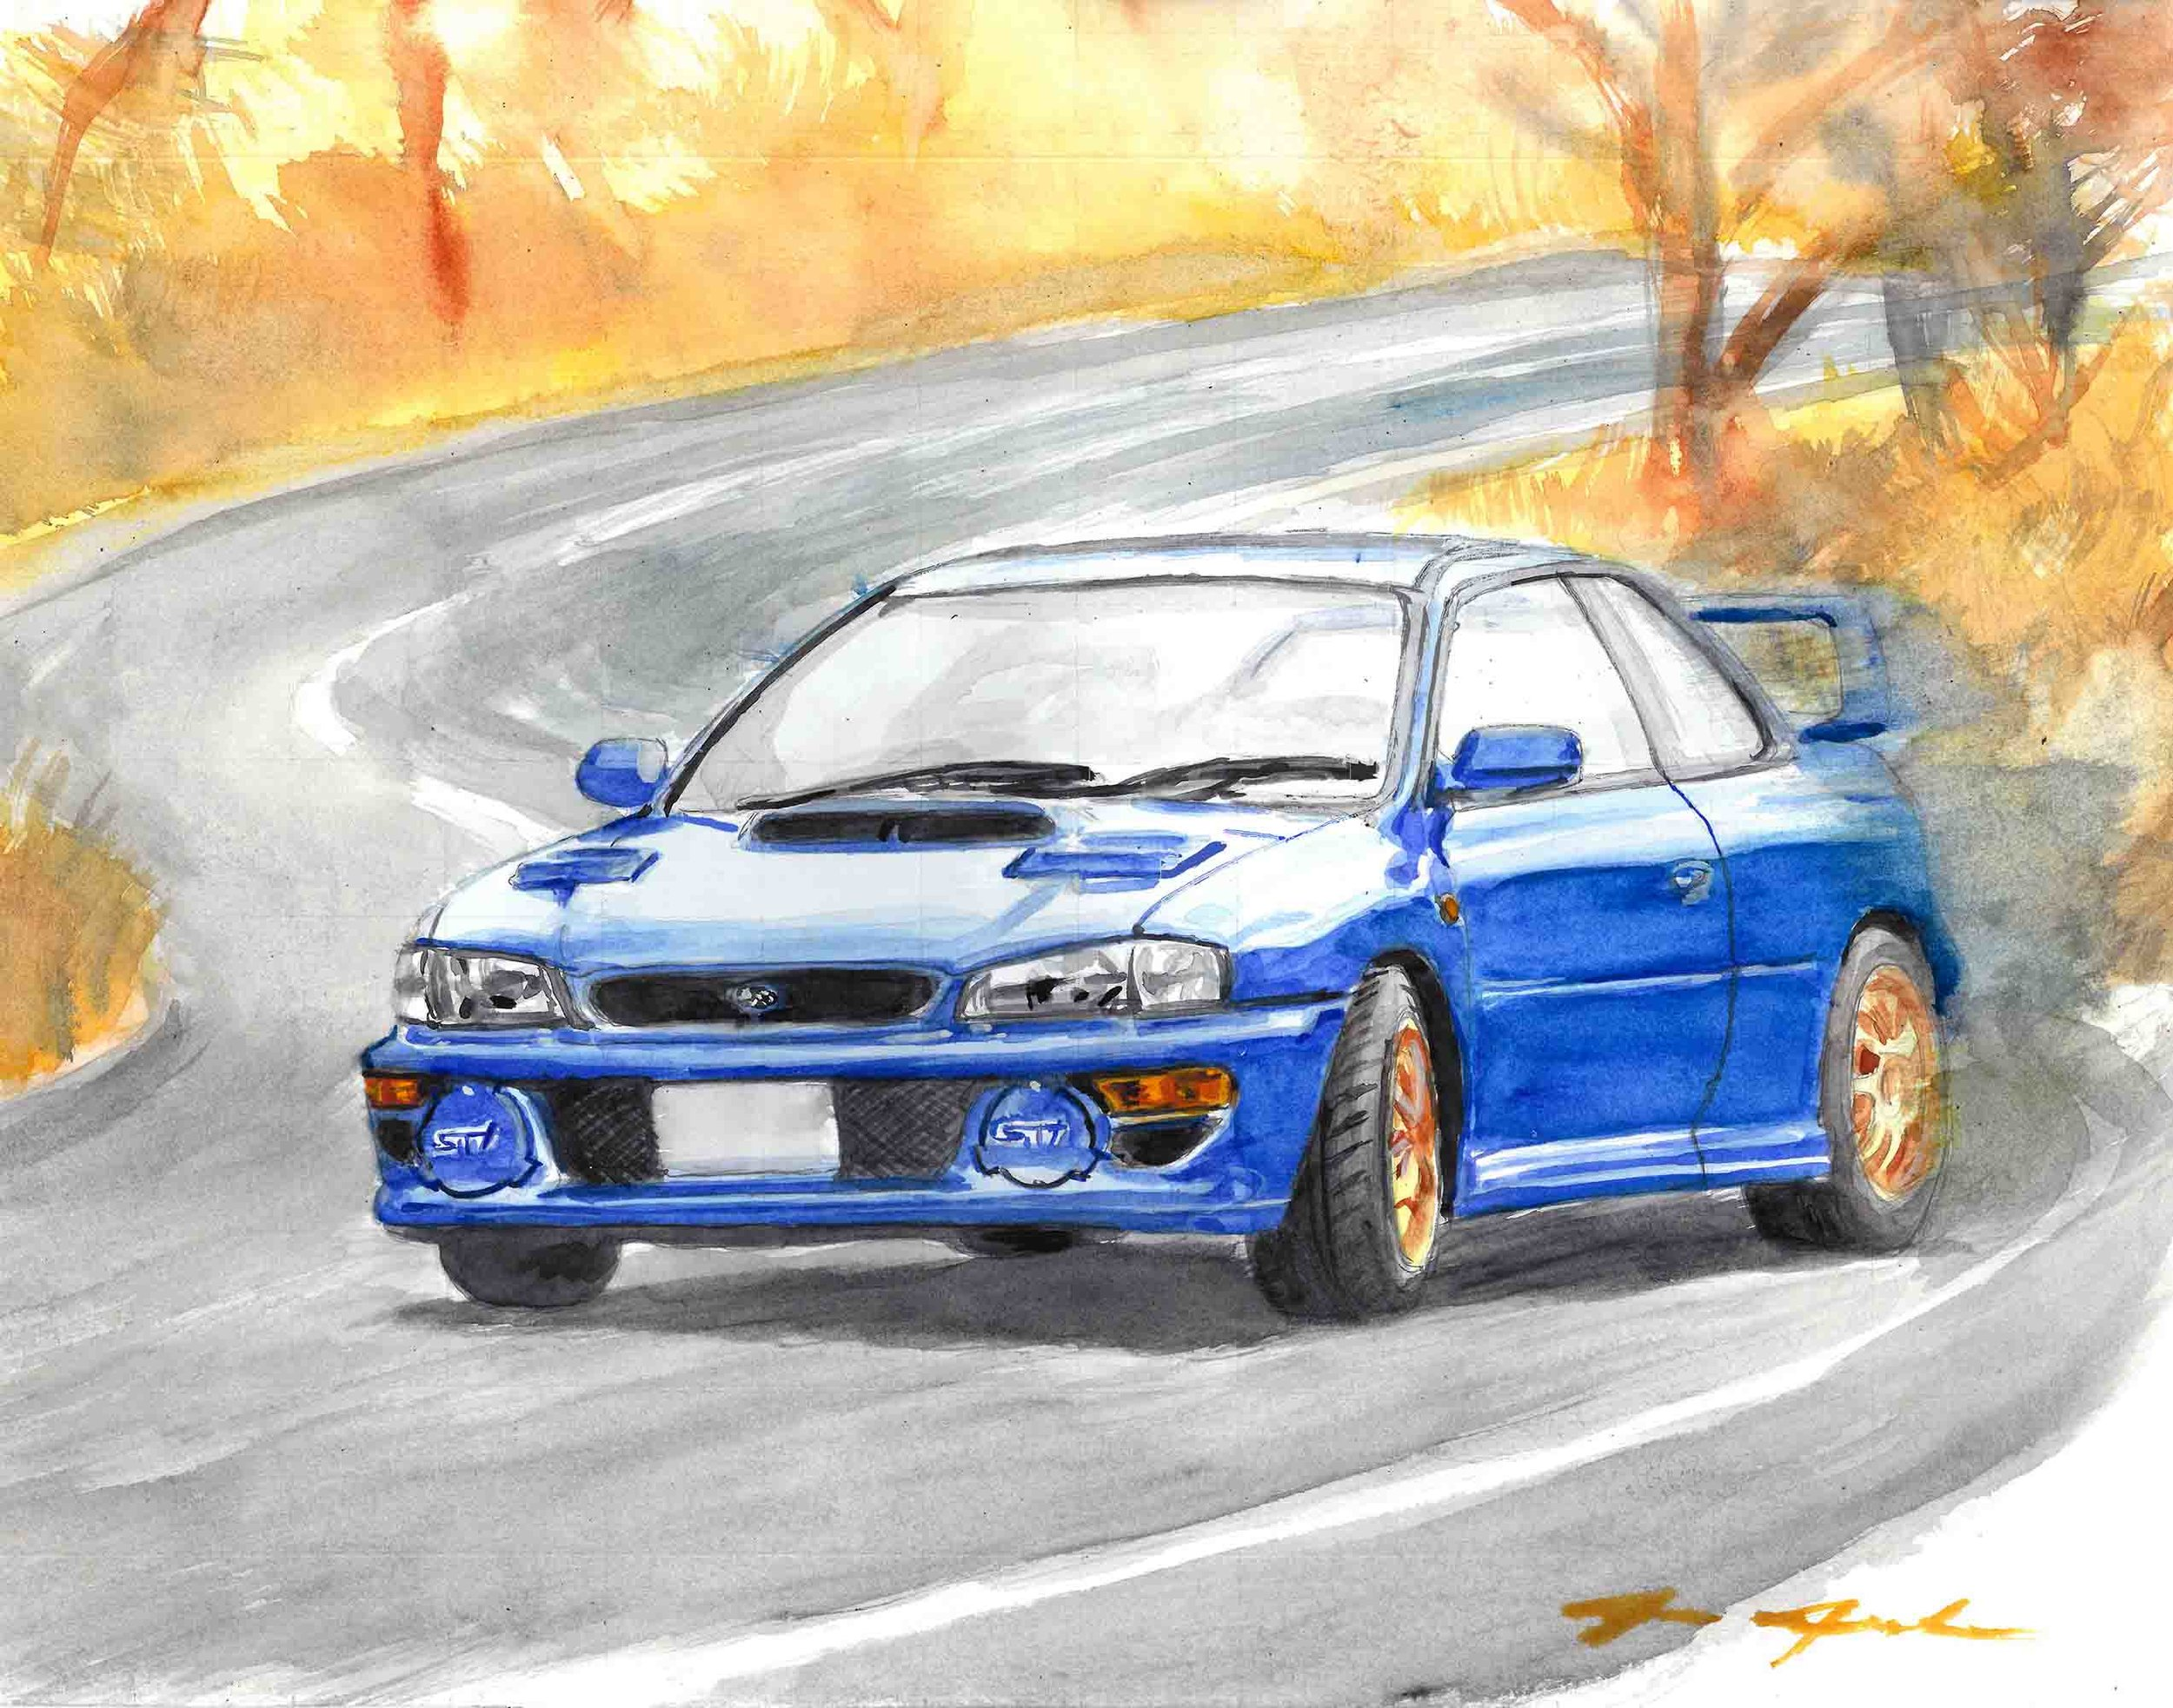 Subaru STI 22B